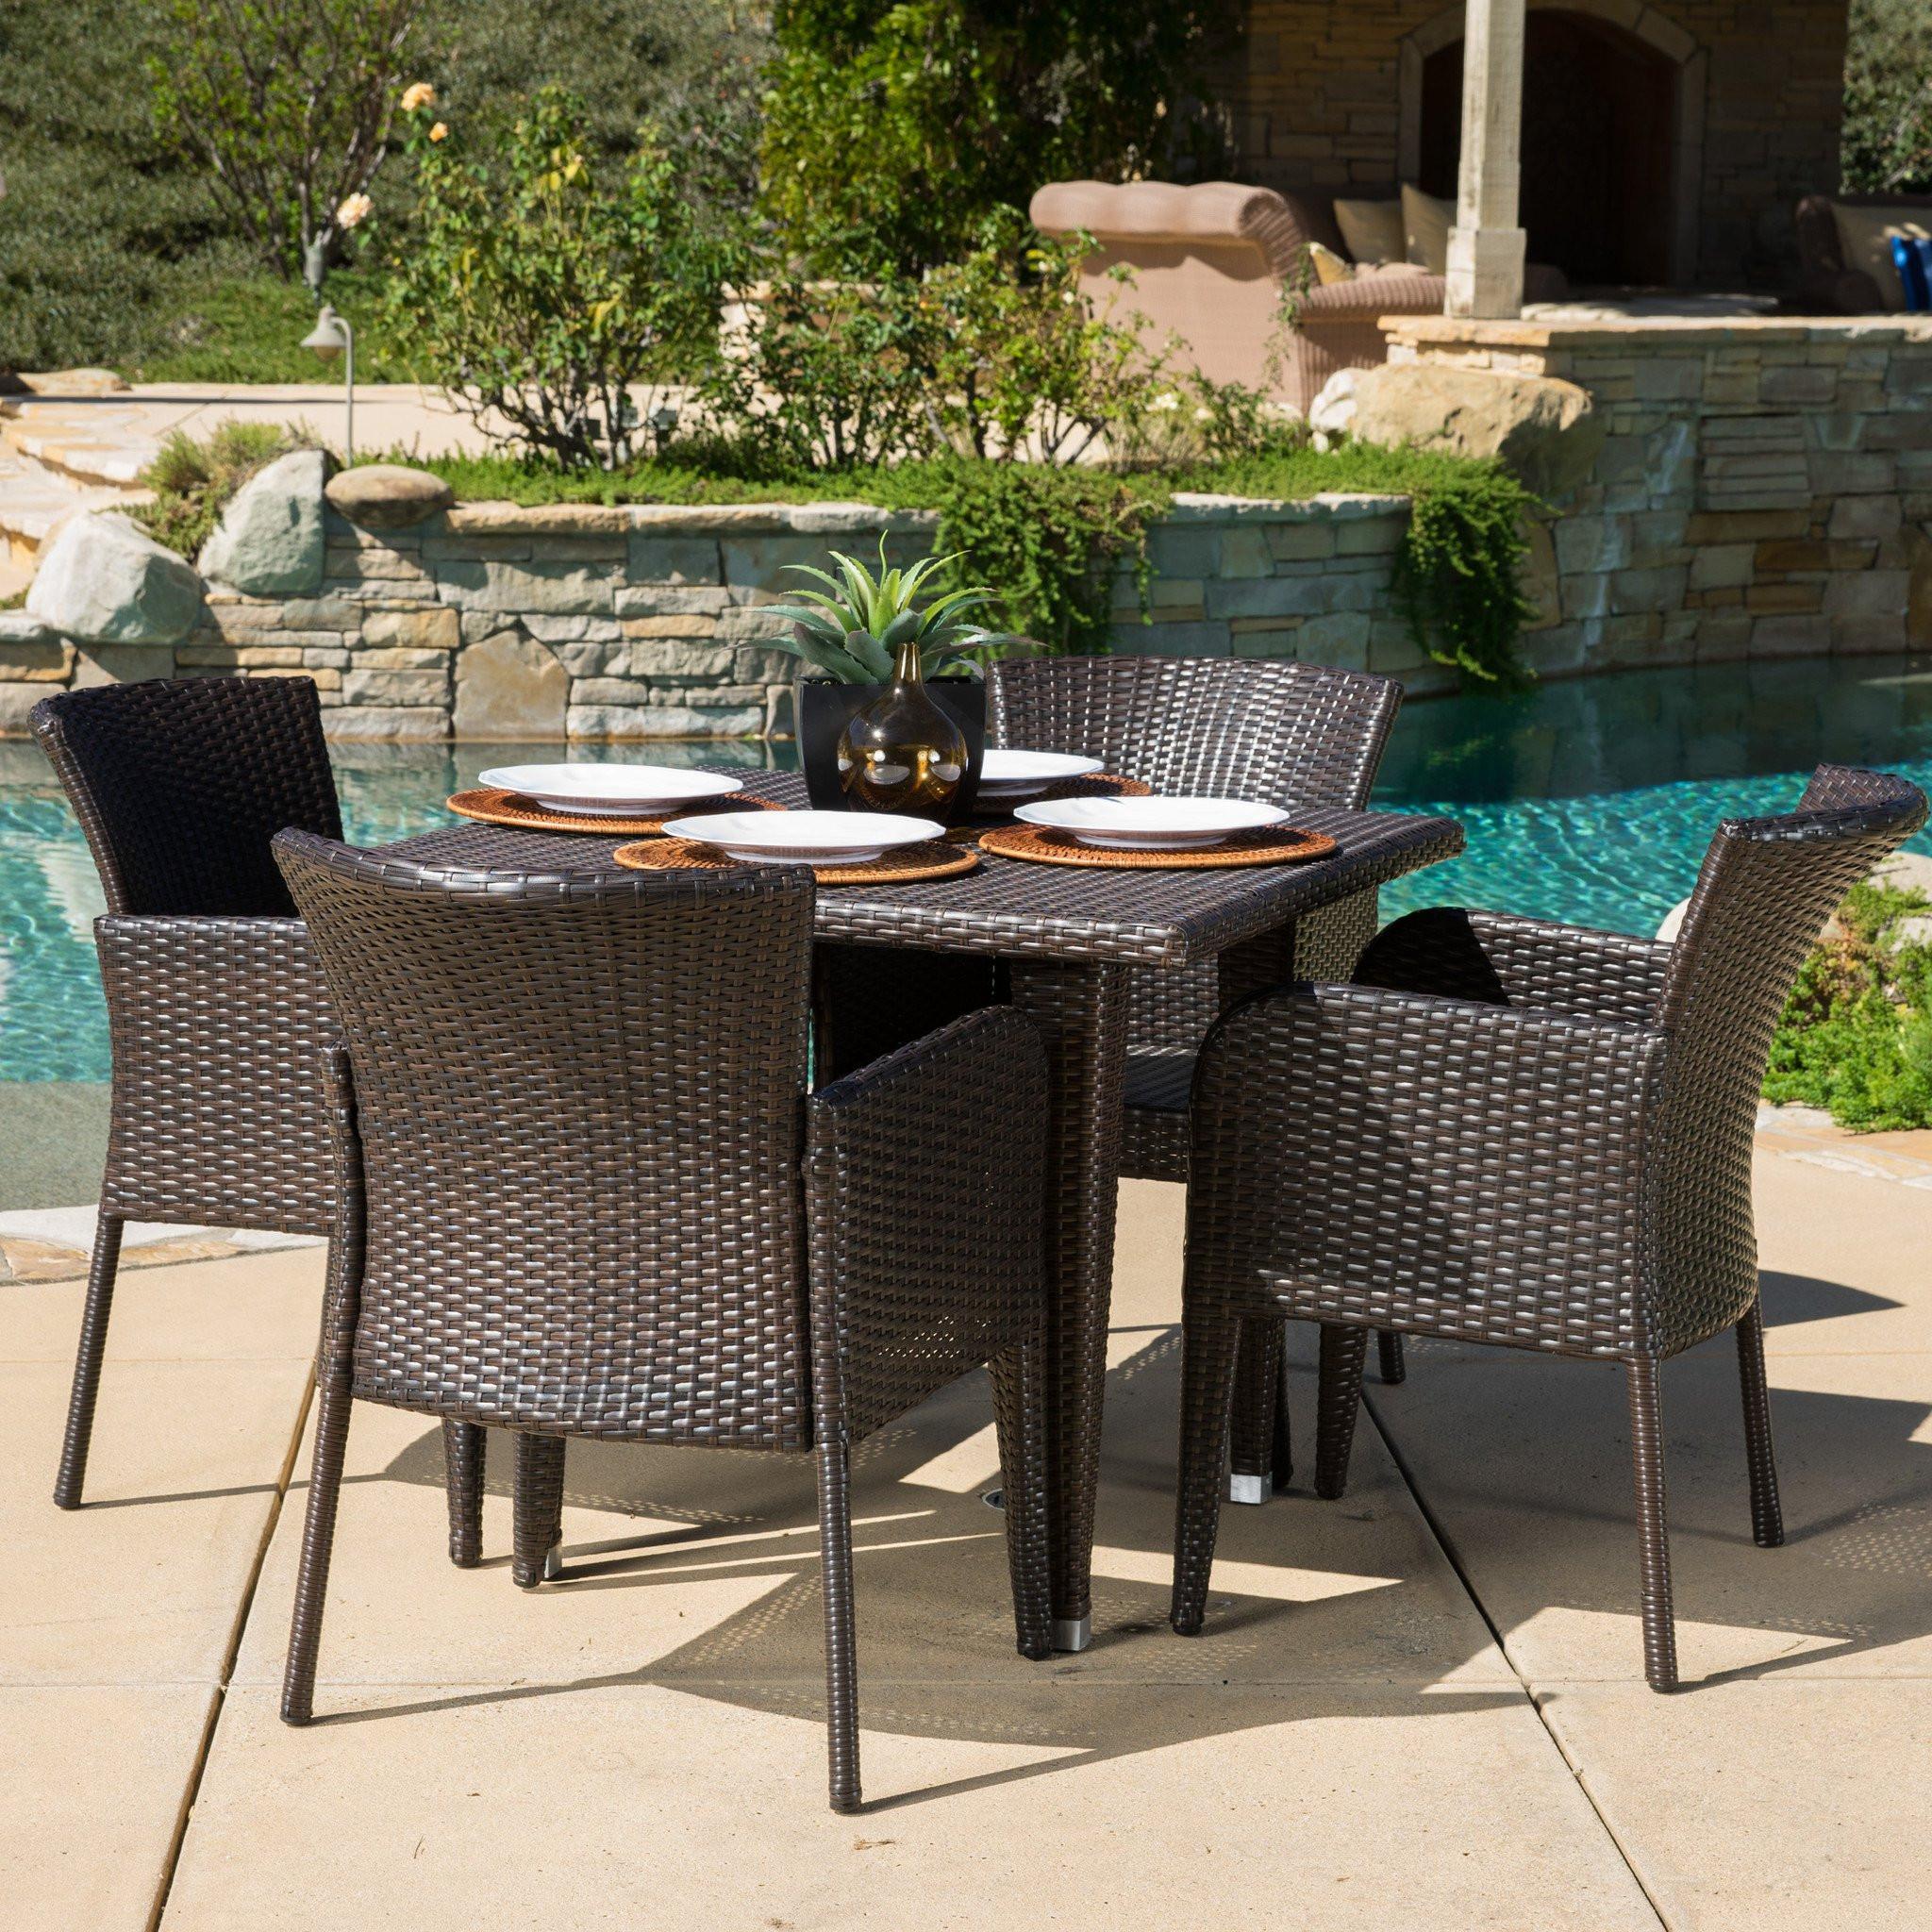 Maple Outdoor 5-piece Wicker Dining Set